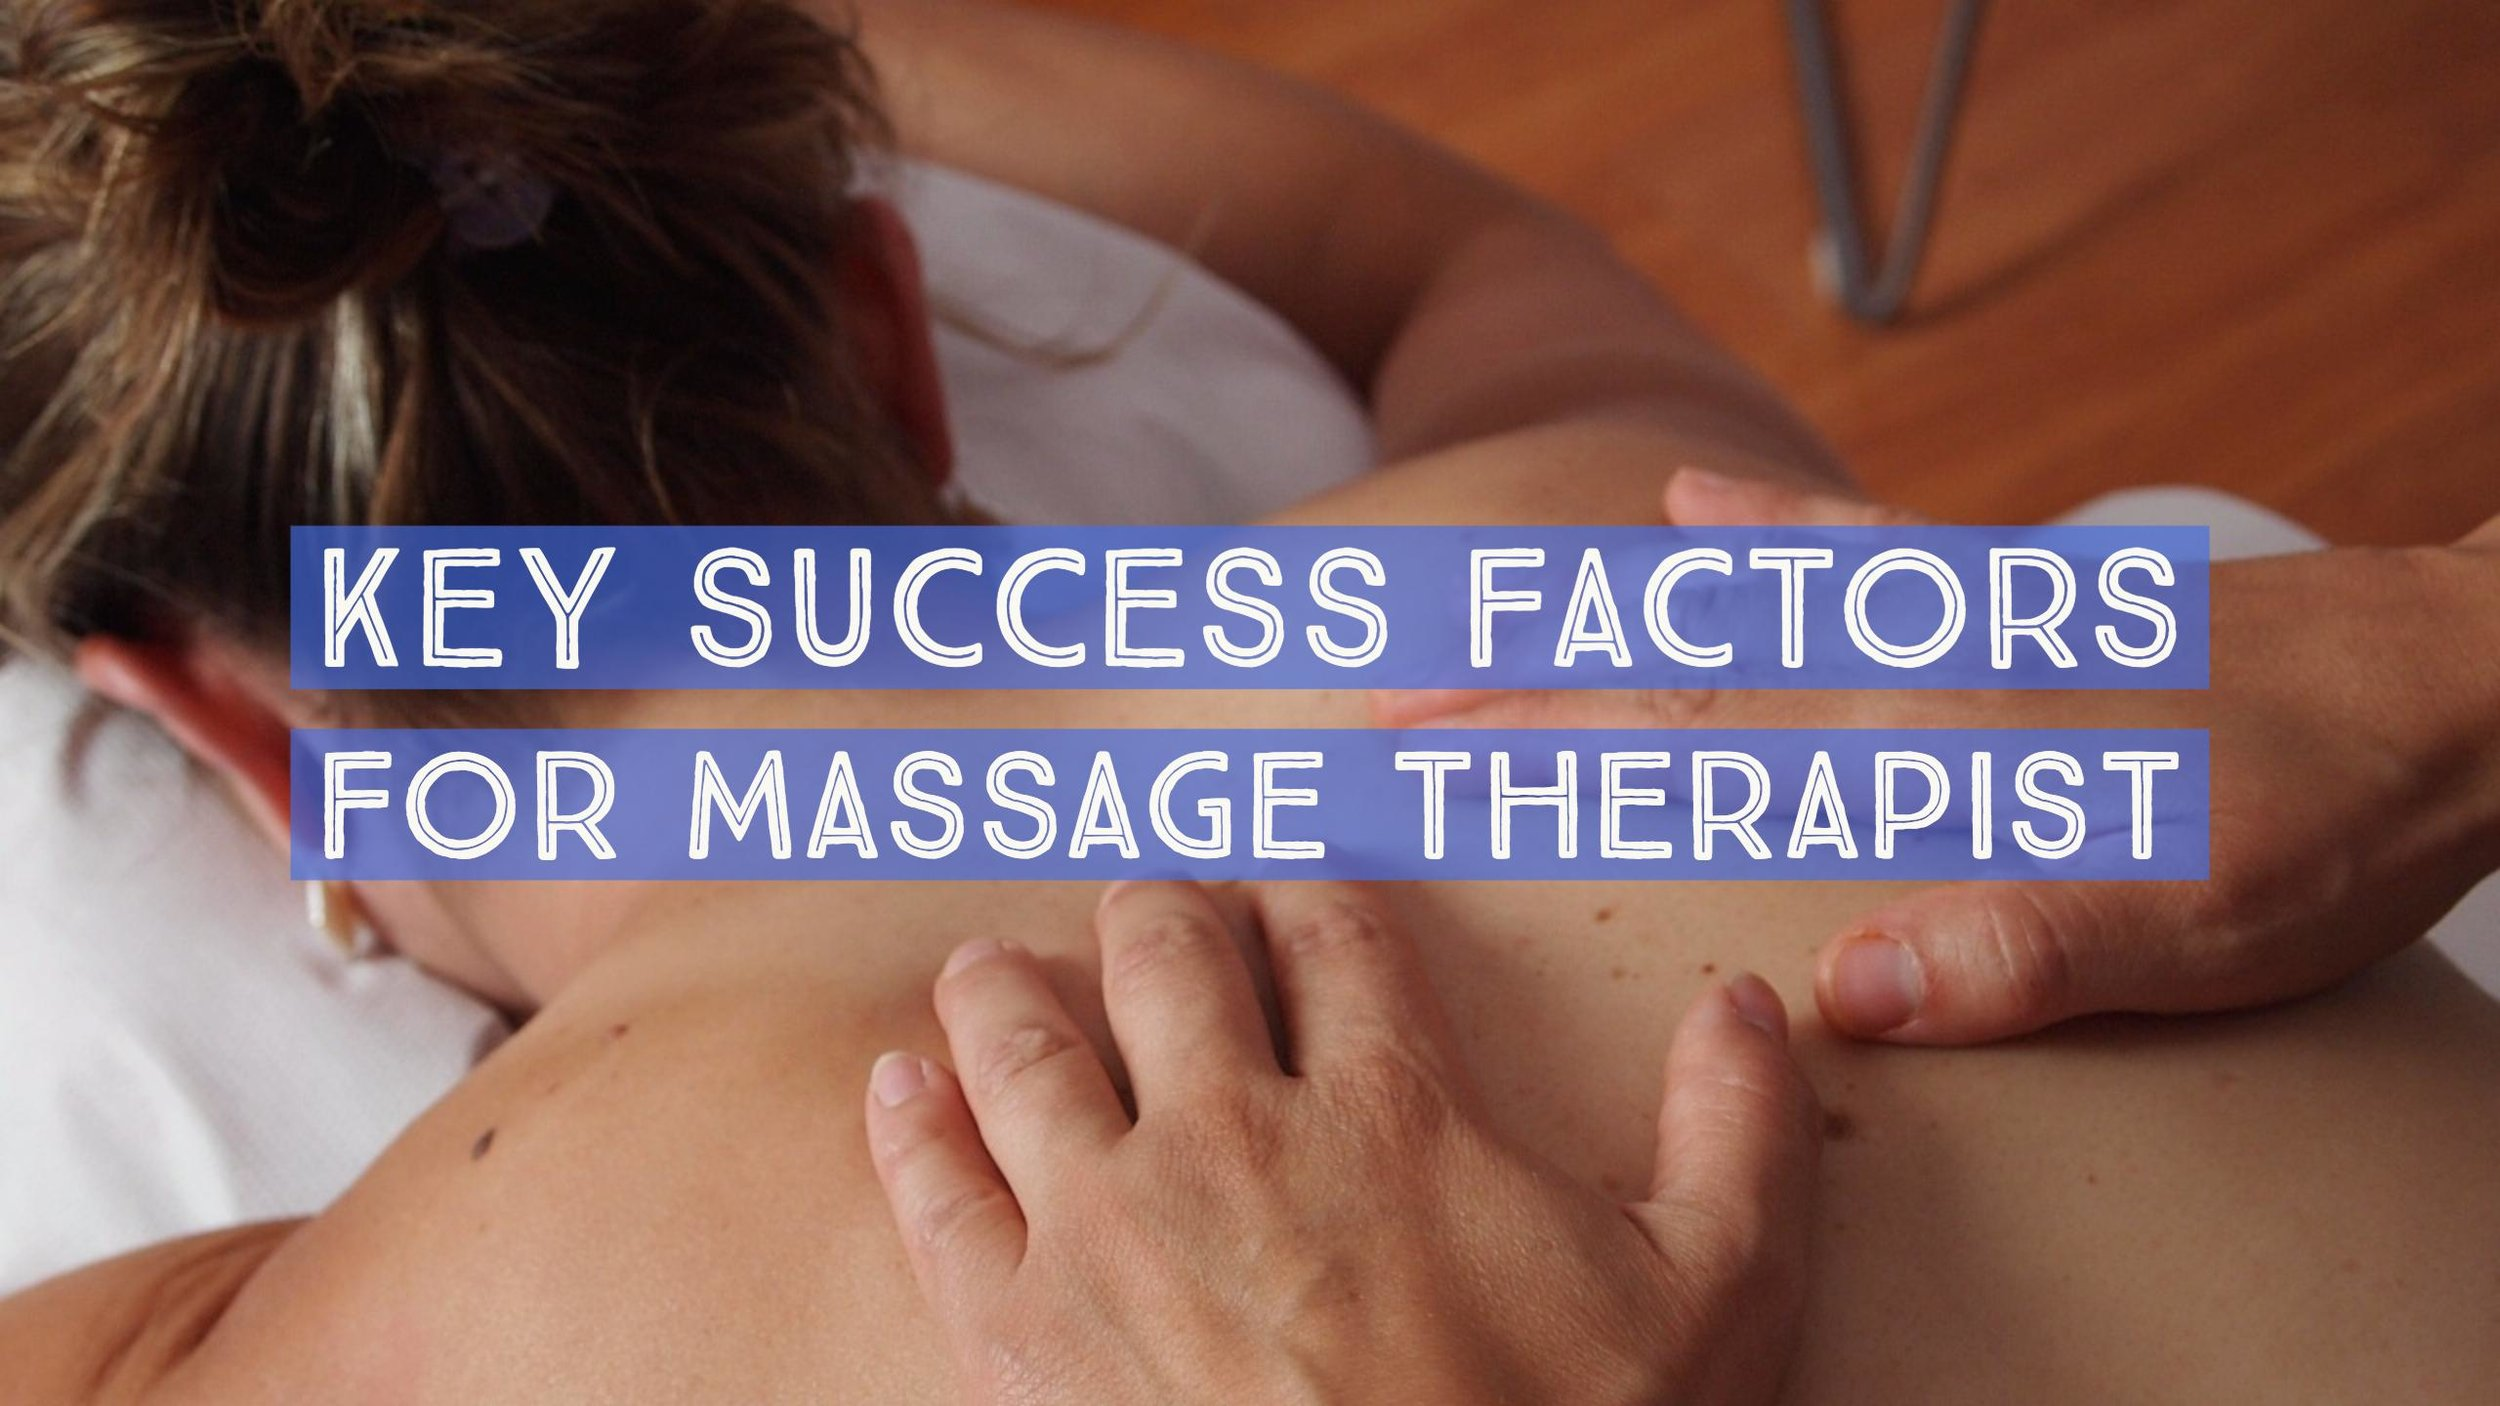 Massage Therapist key success factors